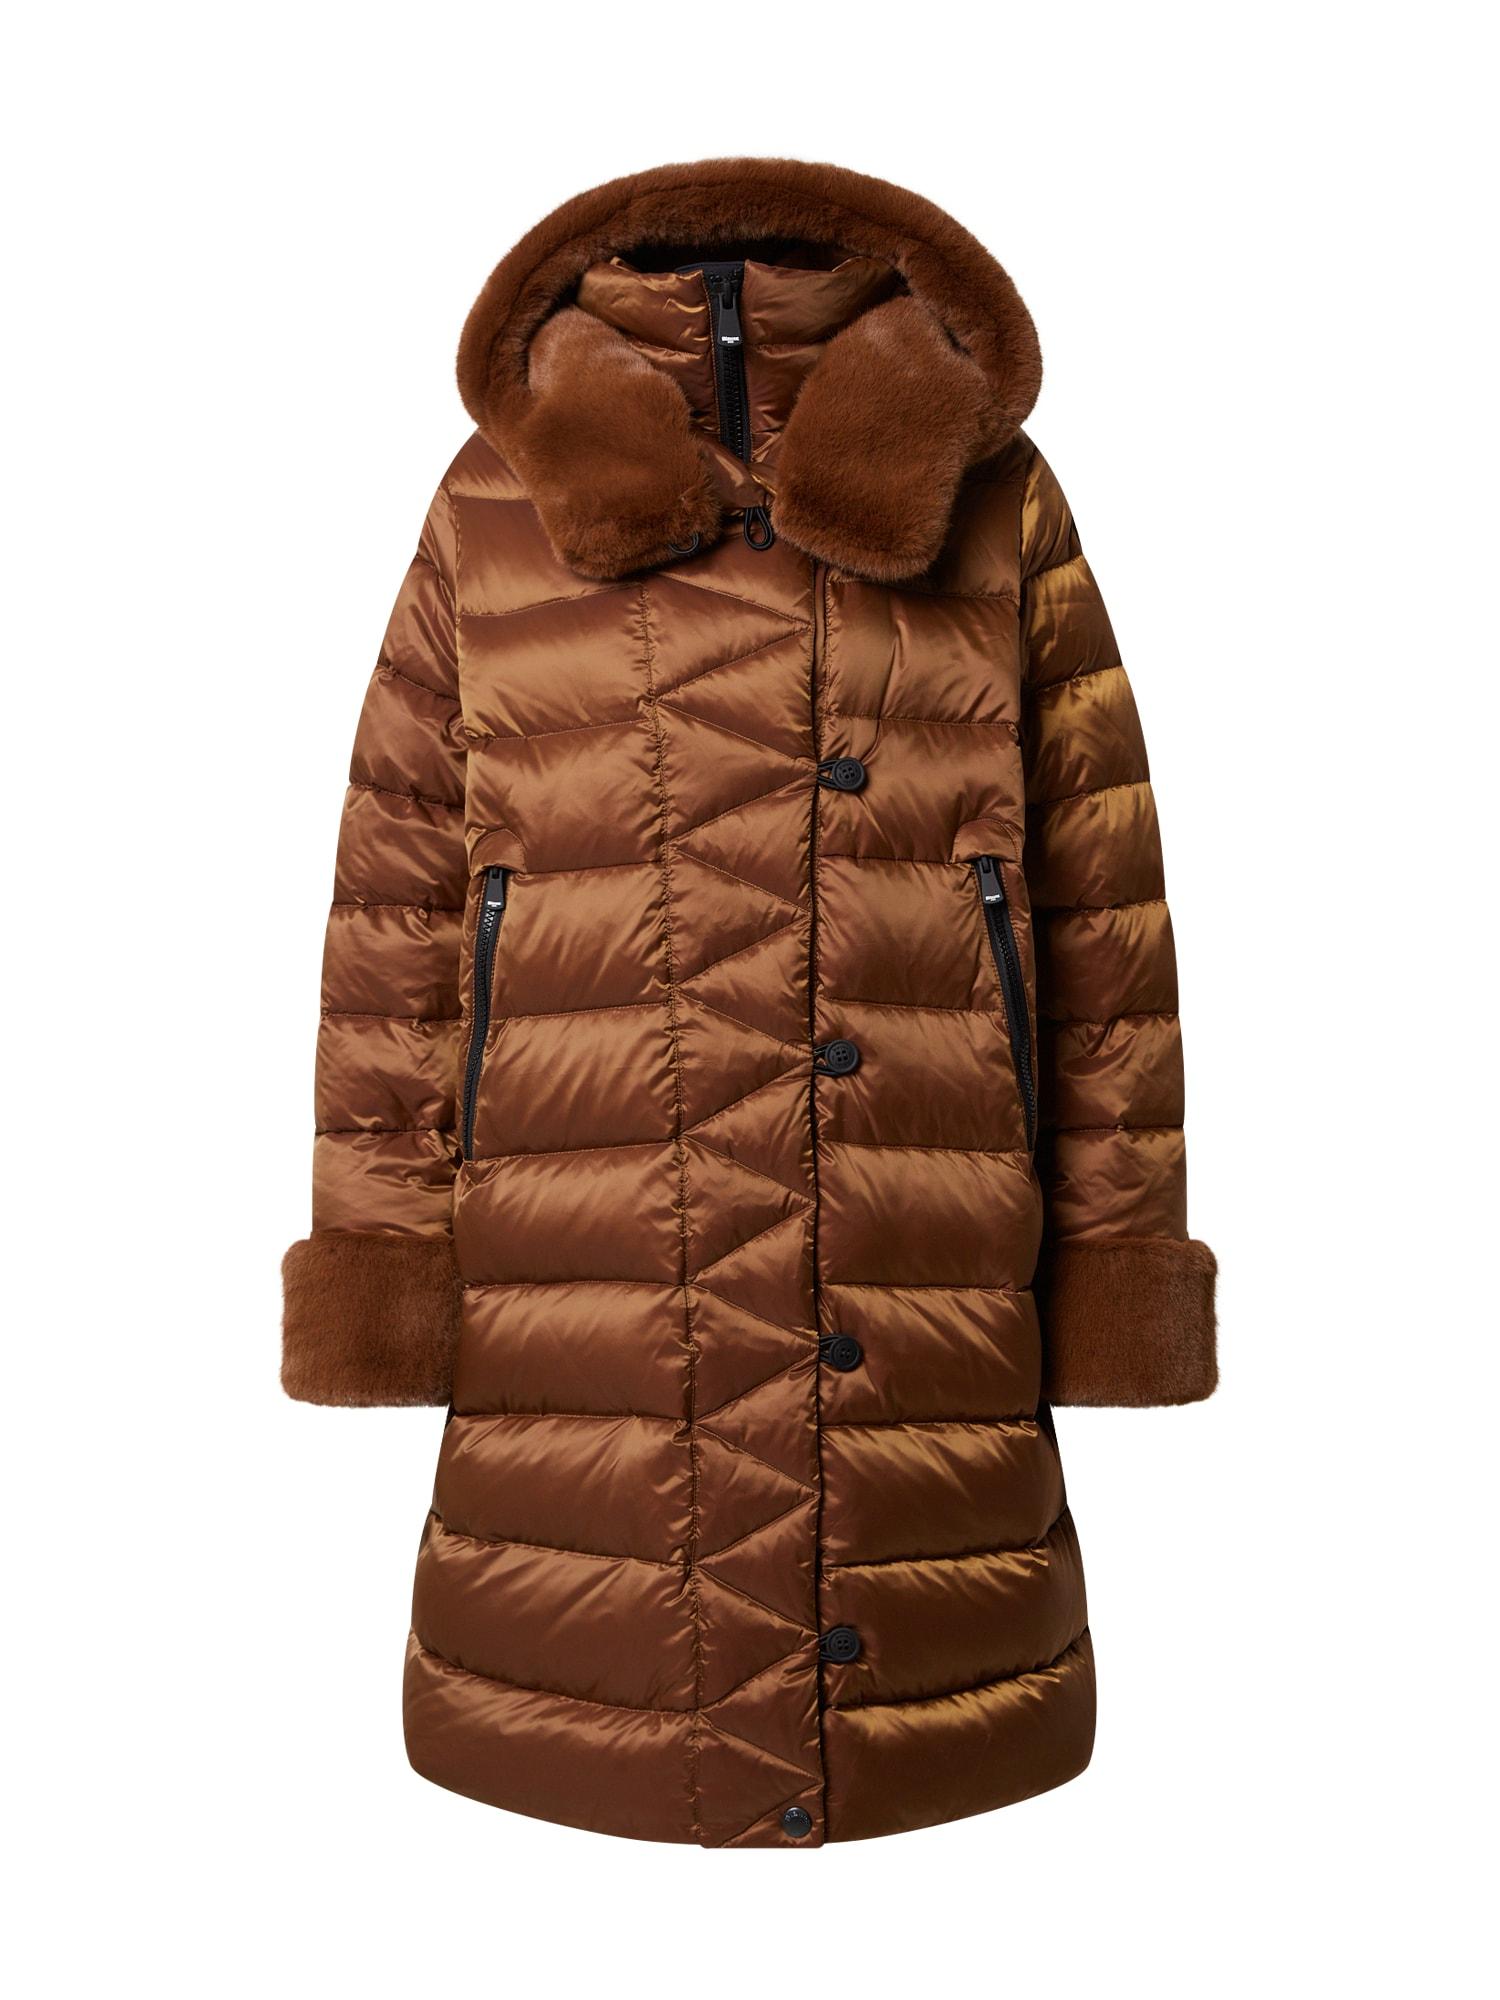 Blauer.USA Demisezoninis paltas ruda (konjako)